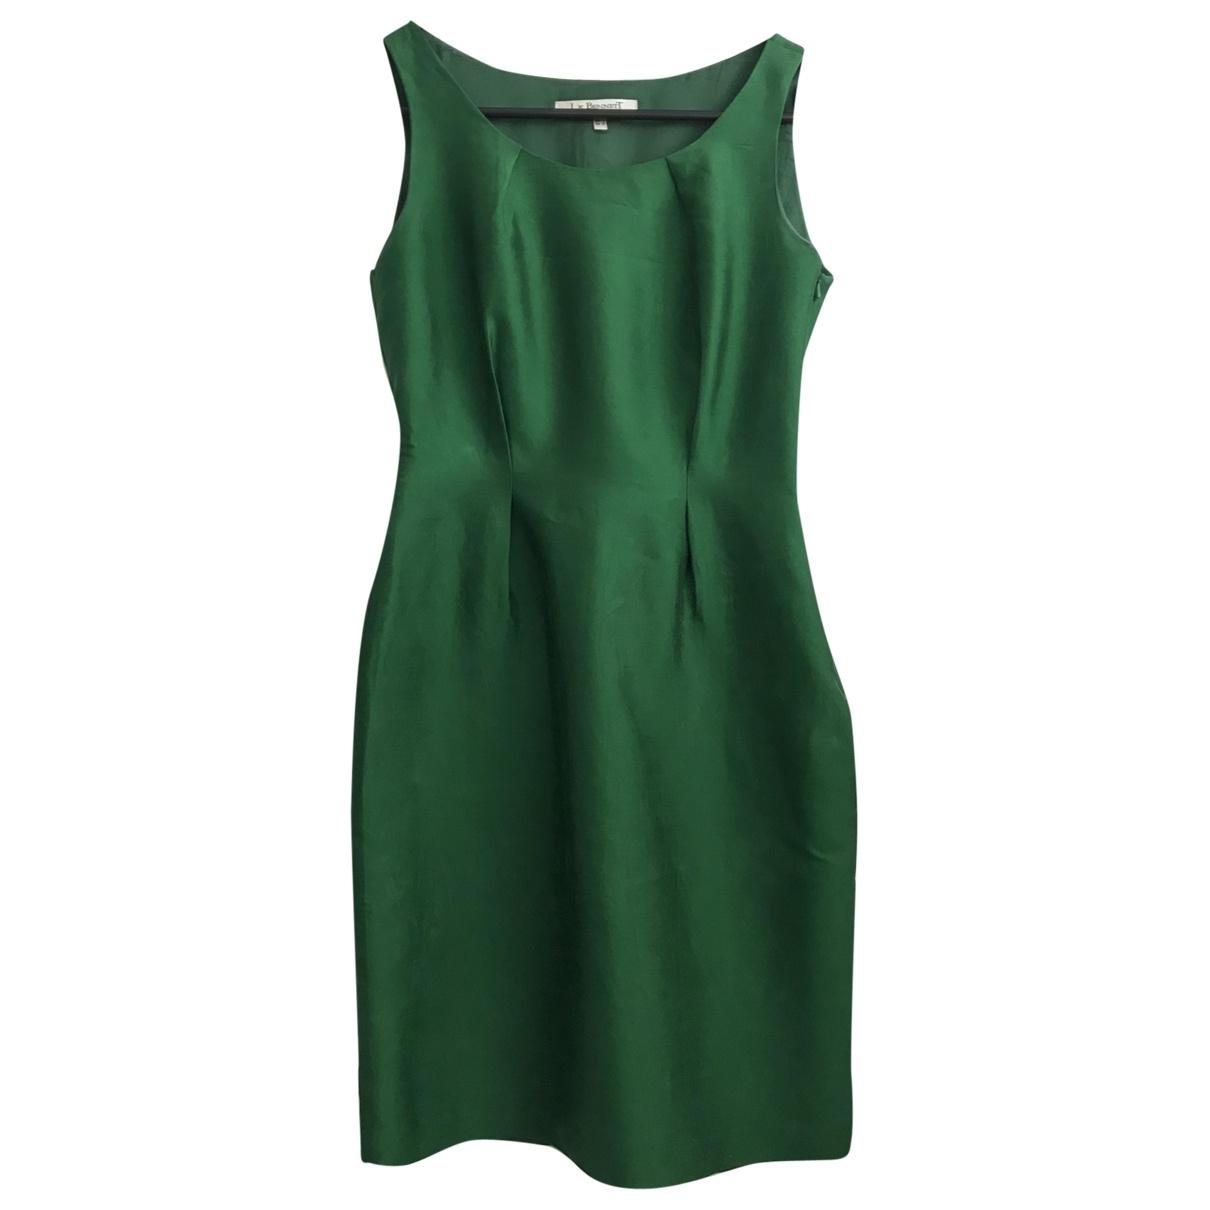 Lk Bennett \N Green Silk dress for Women 34 FR